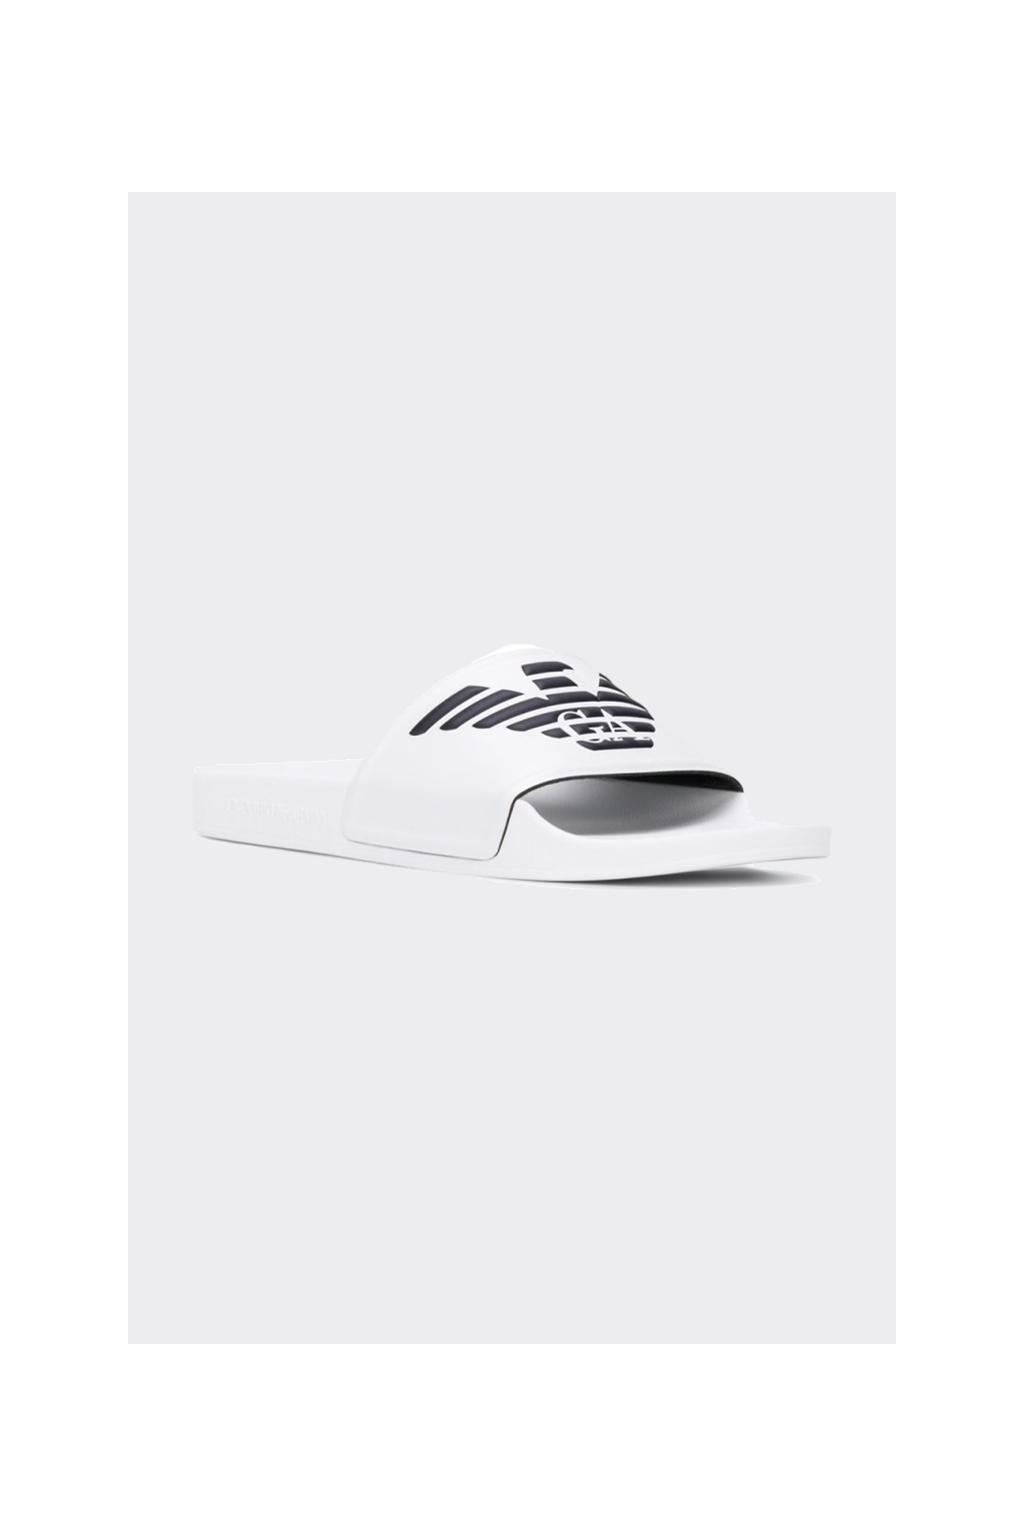 Emporio Armani logo pantofle dámské - bílé